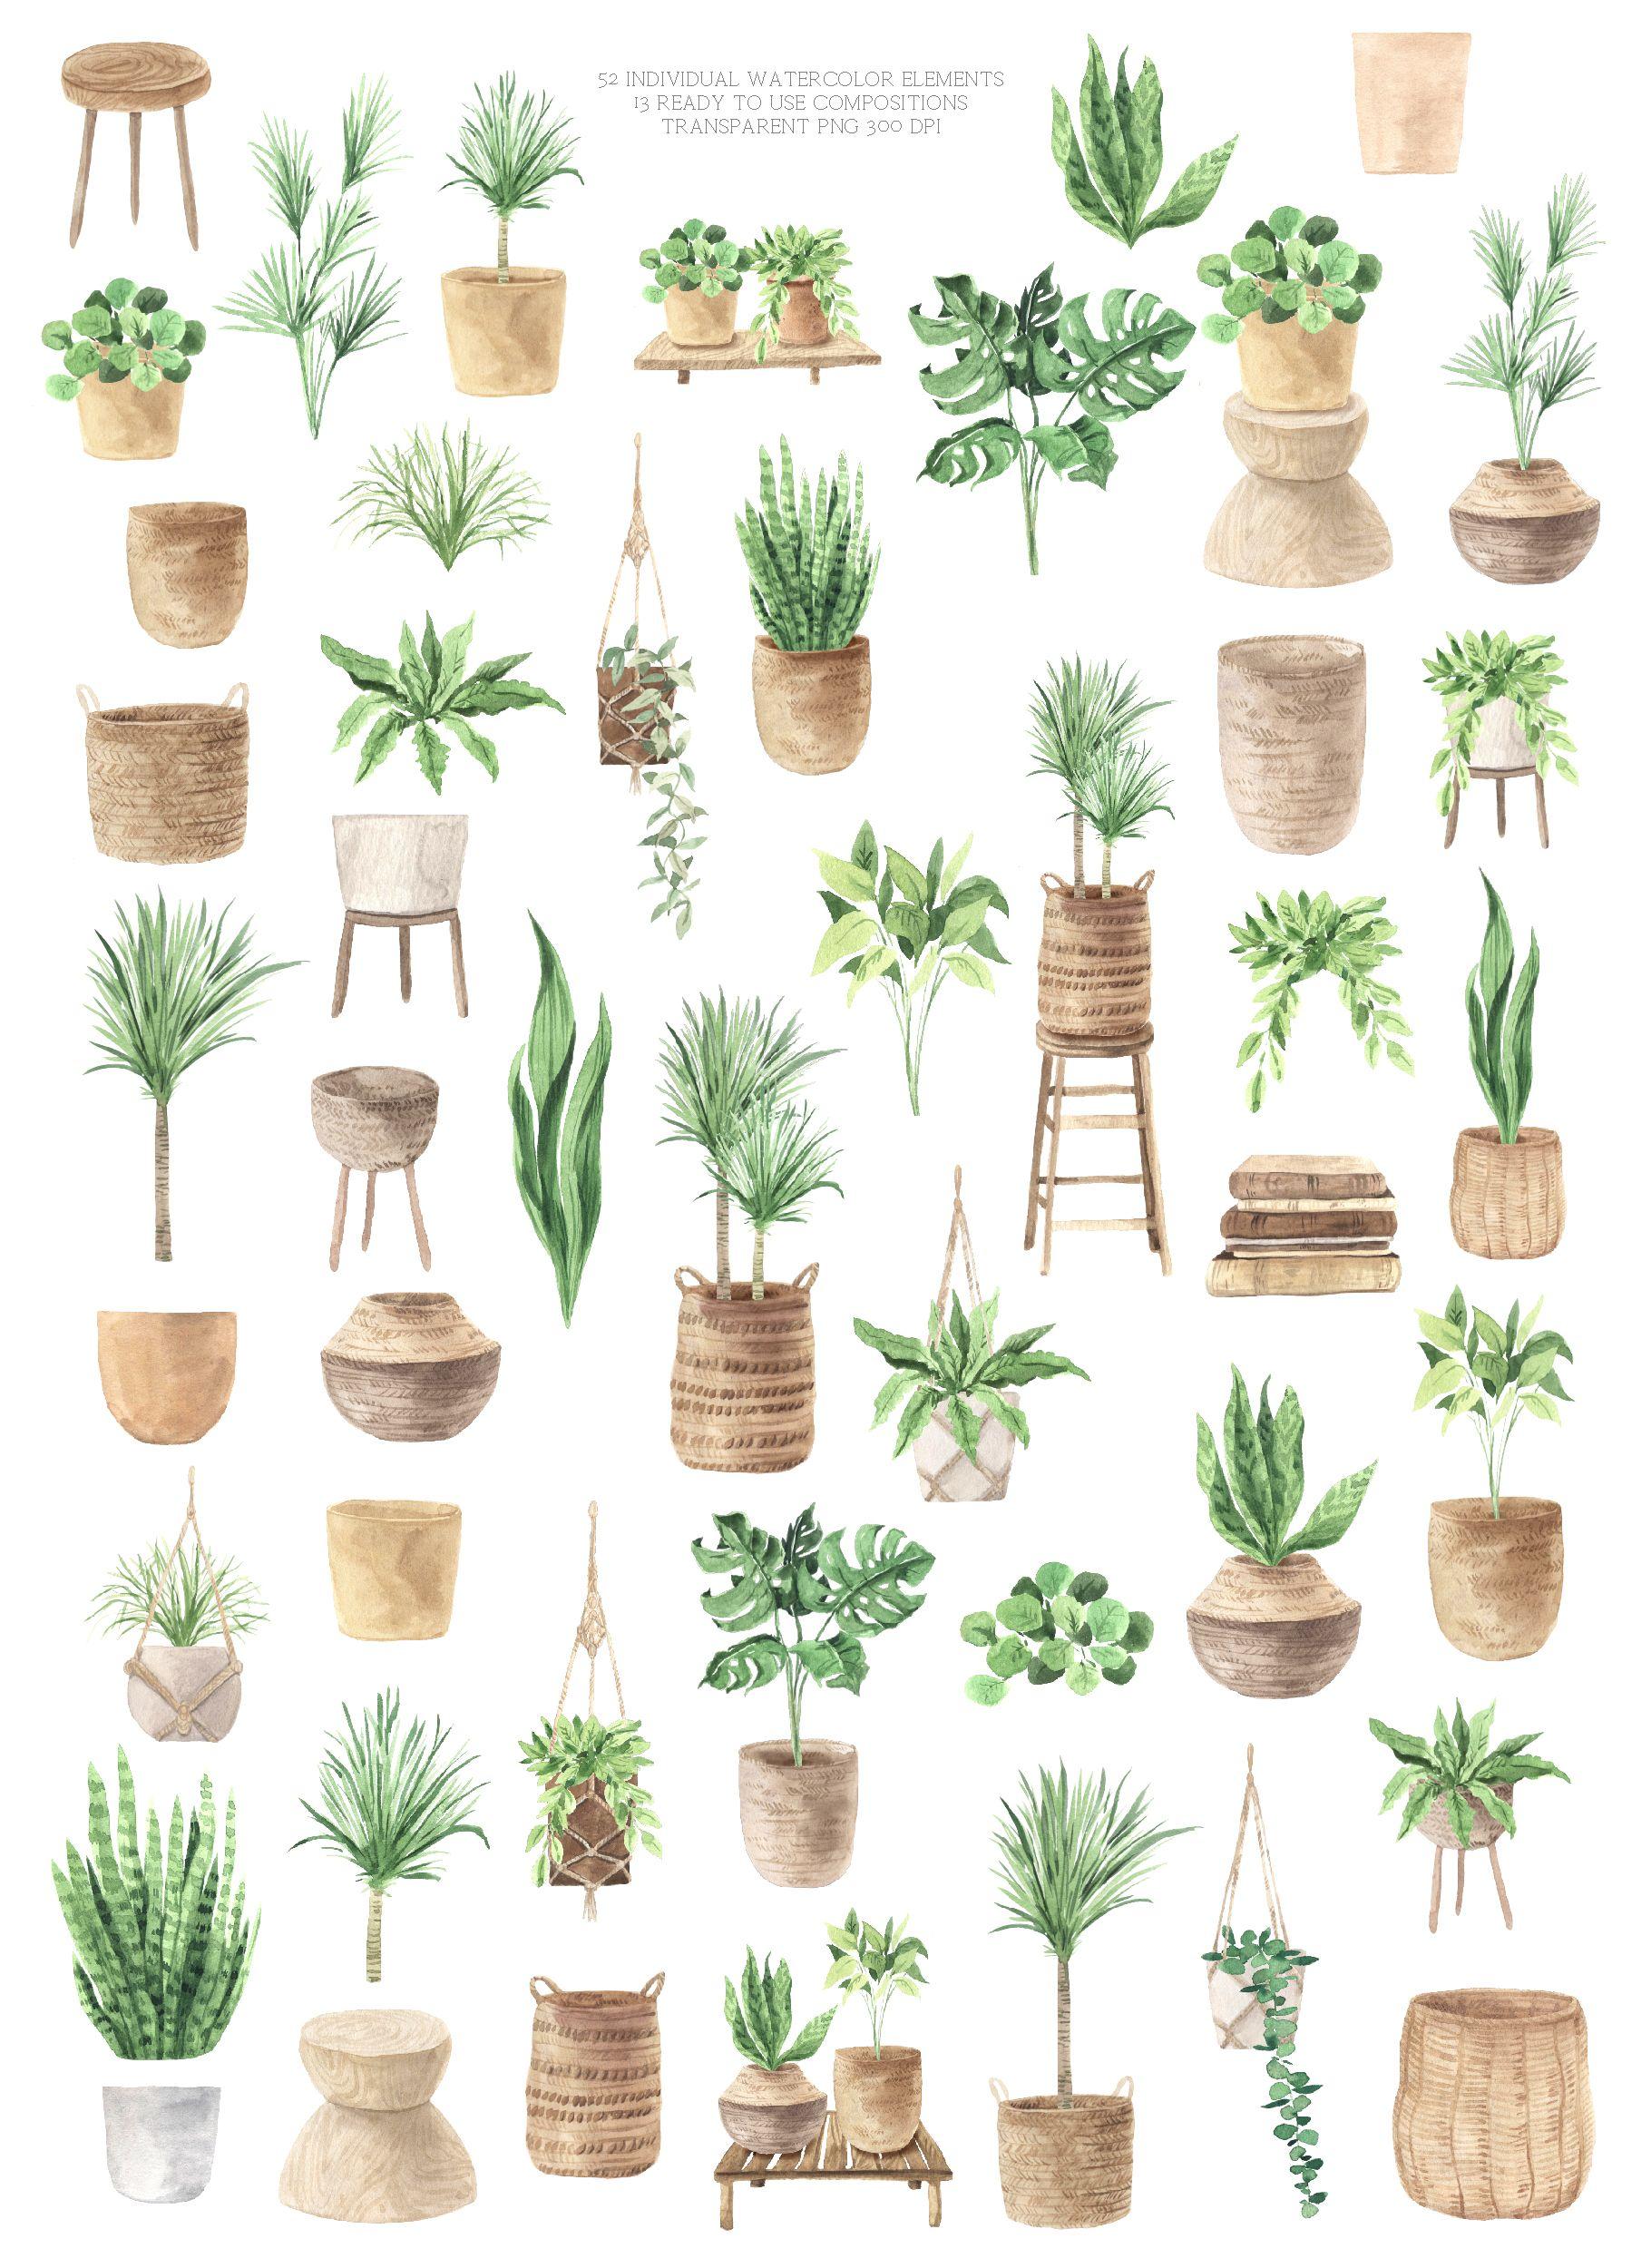 Boho Plant Home Clipart Watercolor House Potted Plant Png Etsy Watercolor Plants Plants Scene Design